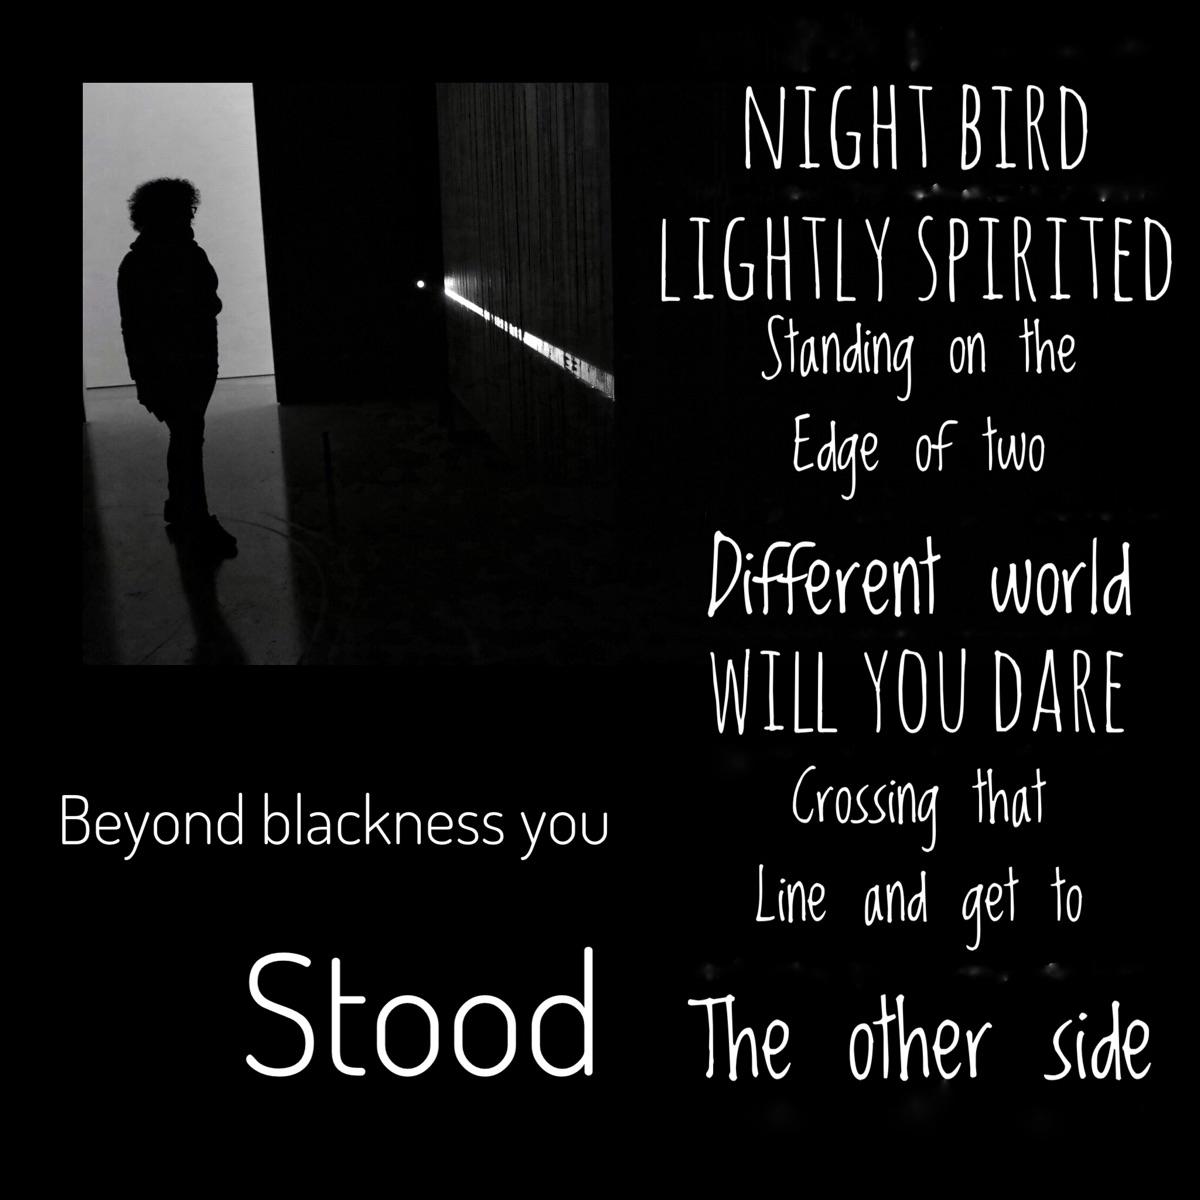 blackness Stood Night bird Ligh - thenmh | ello